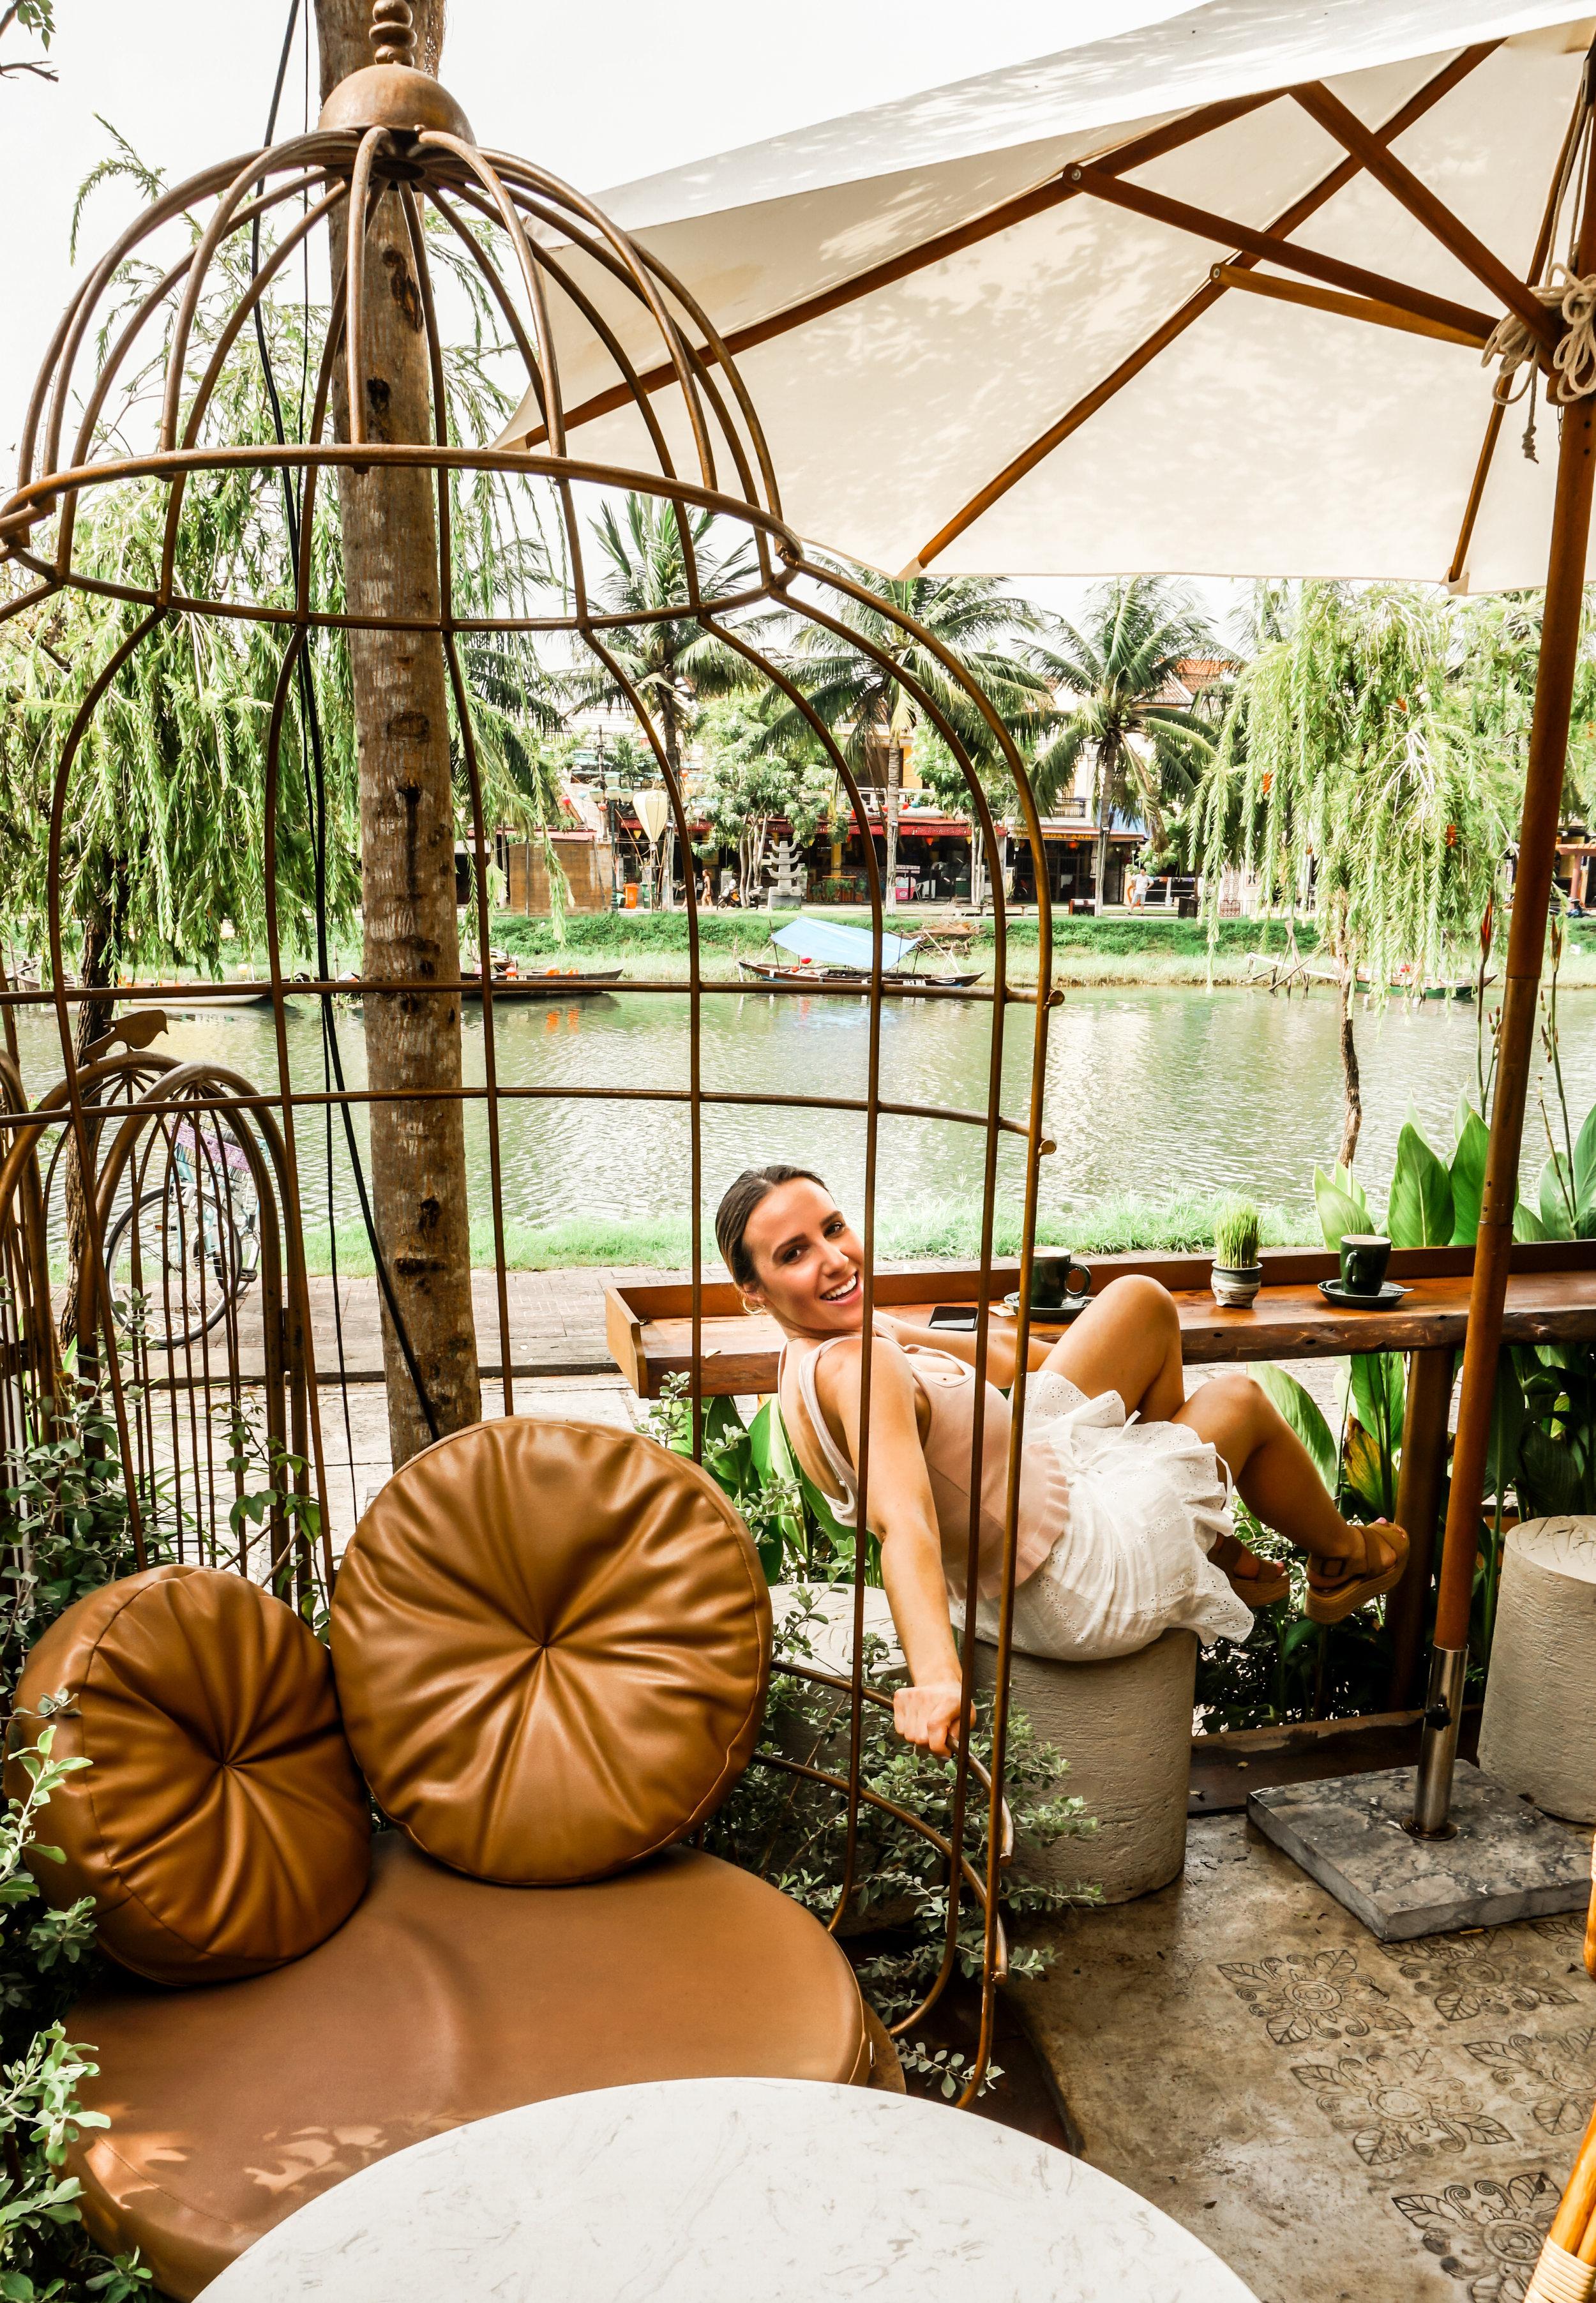 bird-cage-vietnam-meaning-symbol-2019.jpg